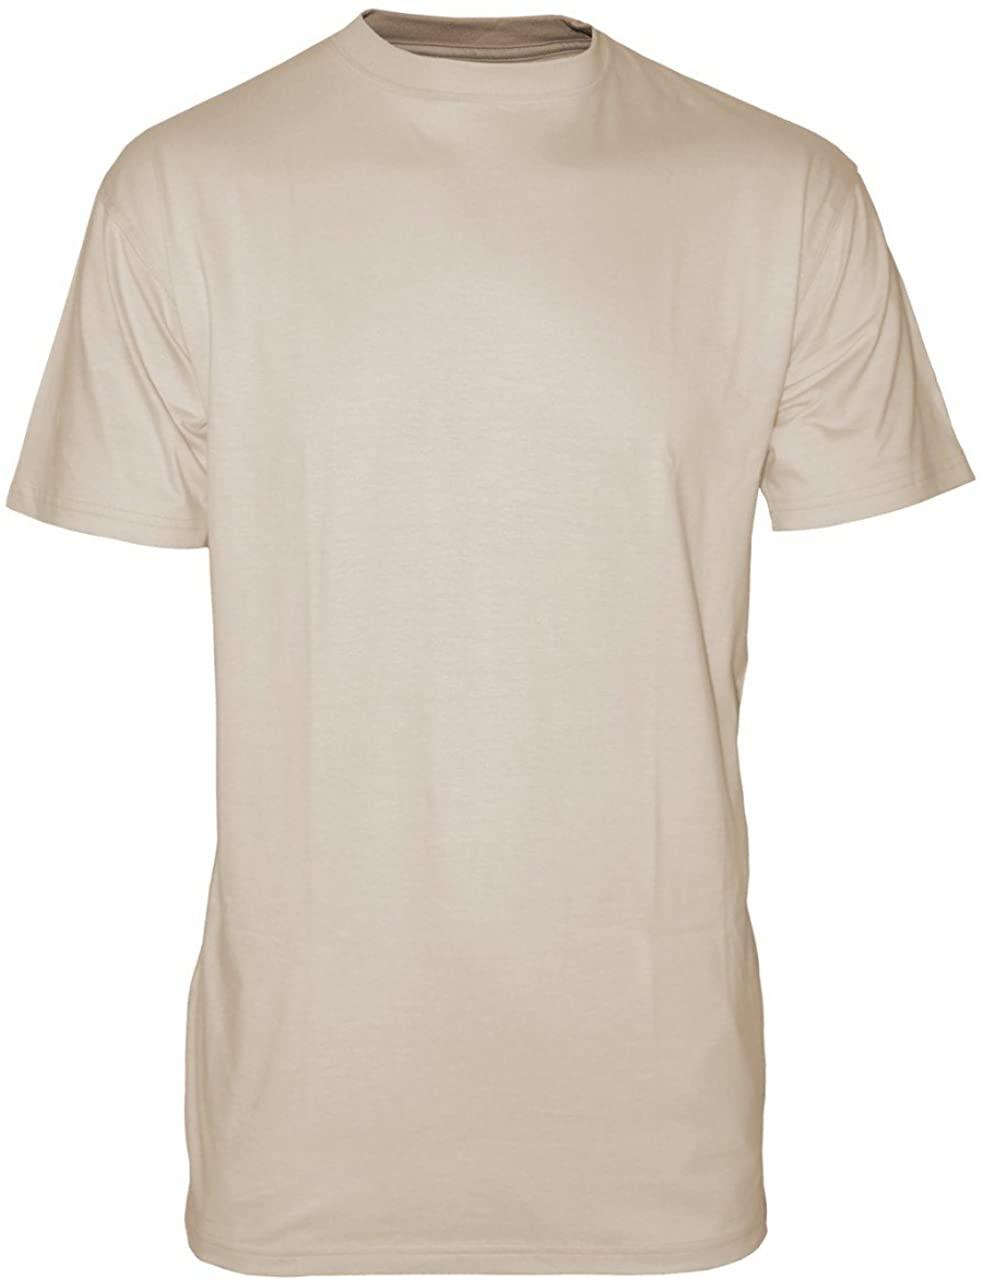 T-Shirt, NSN 8415-01-519-8788, X-LARGE, Tan (Sand), for ACU/ABU Uniform, 3-Pack